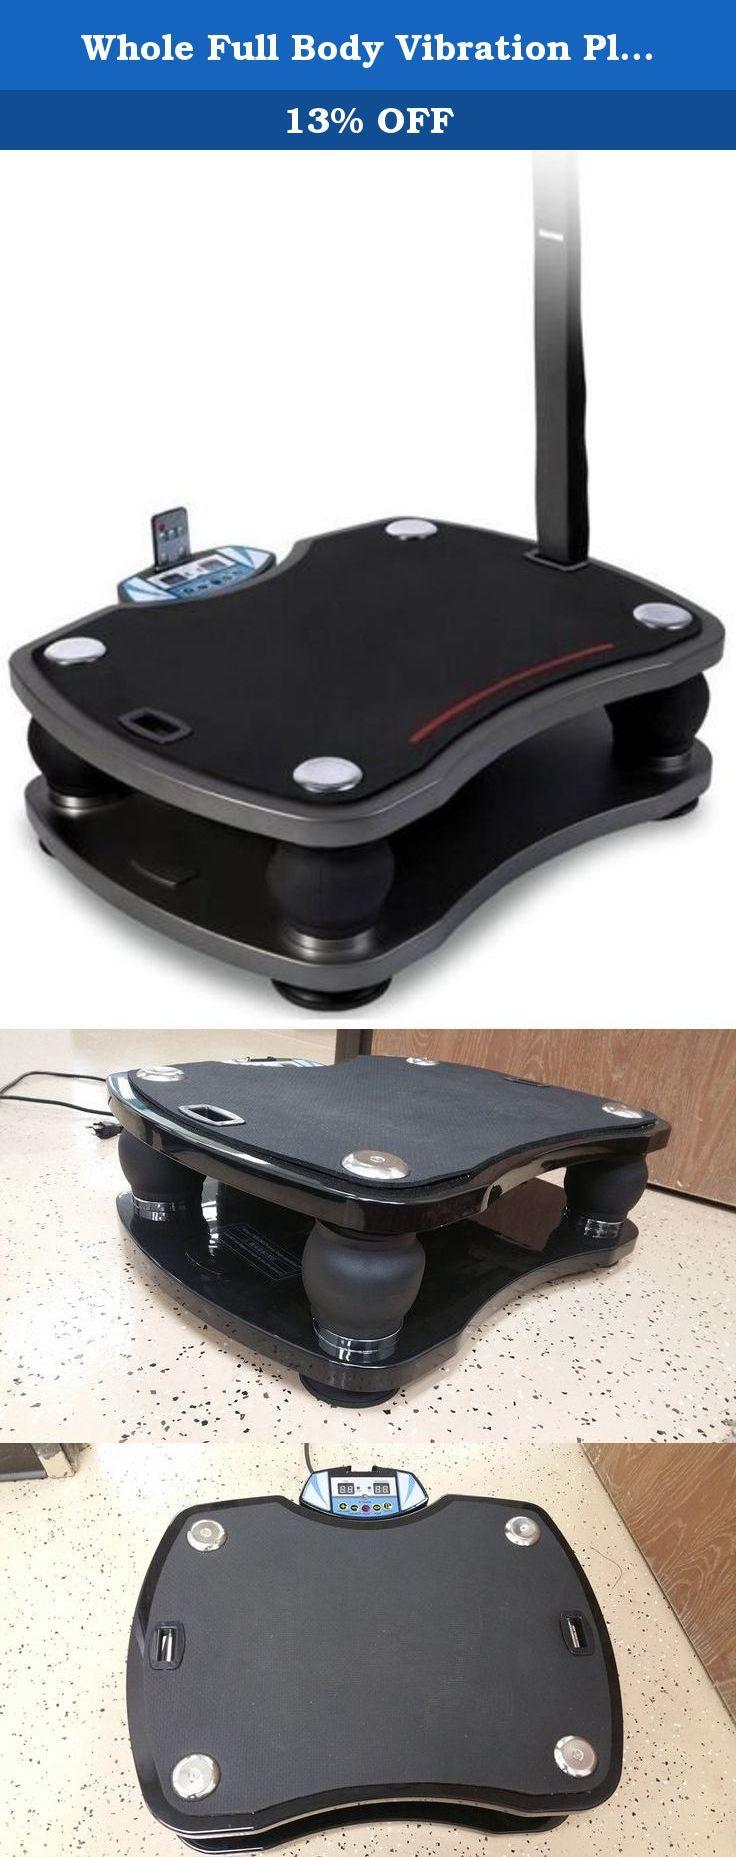 whole vibration plate exercise machine portable 500w